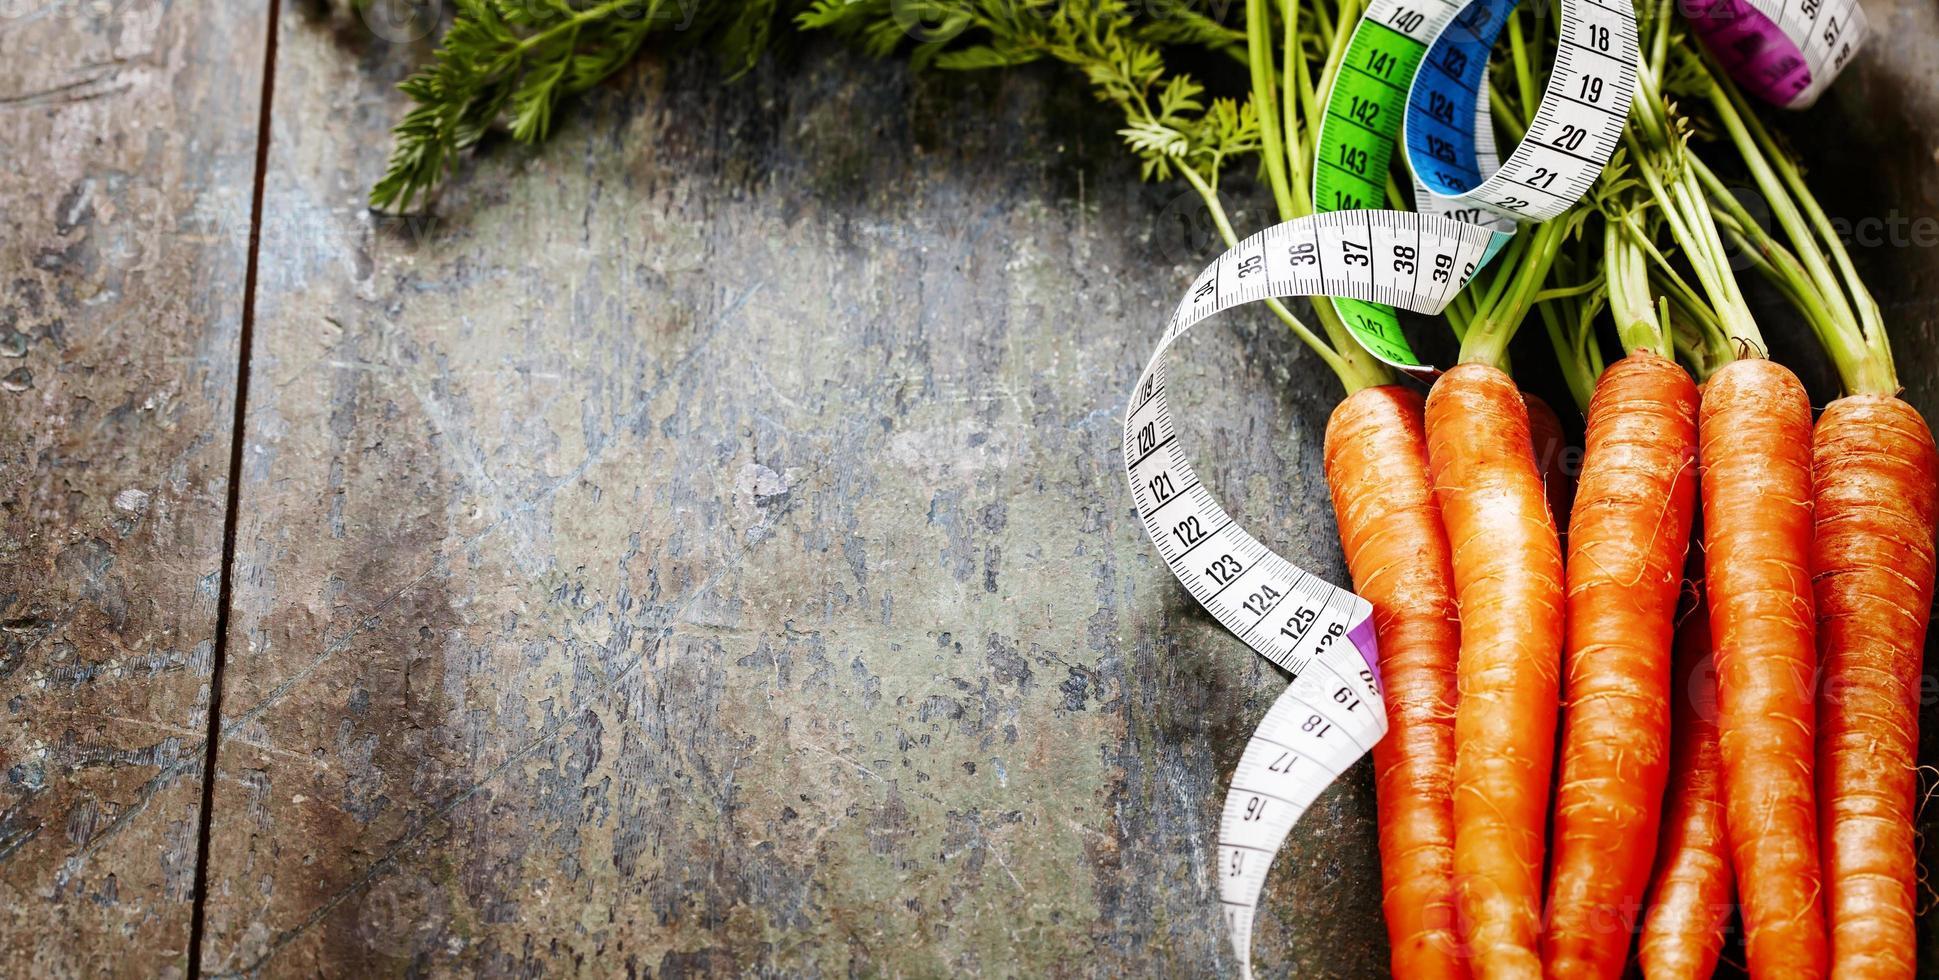 fresh carrots measurement tape photo